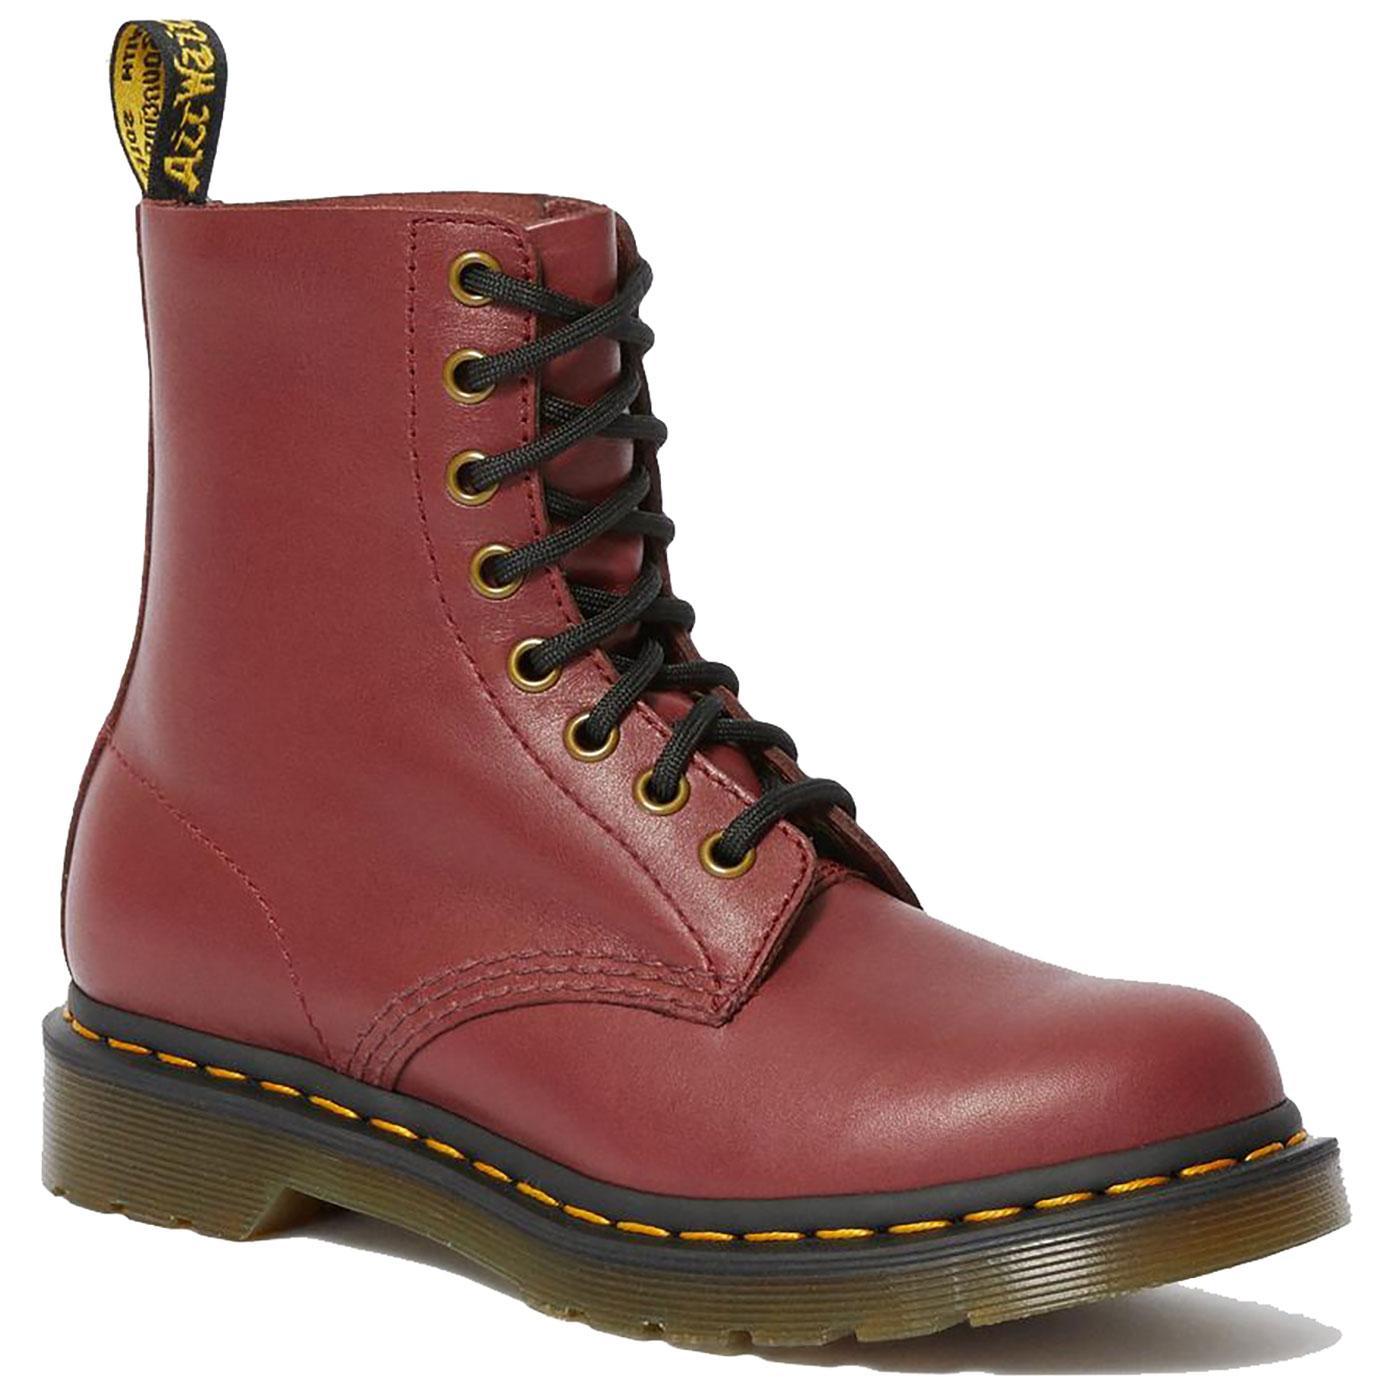 1460 Pascal Wanama DR MARTENS Womens Retro Boots C